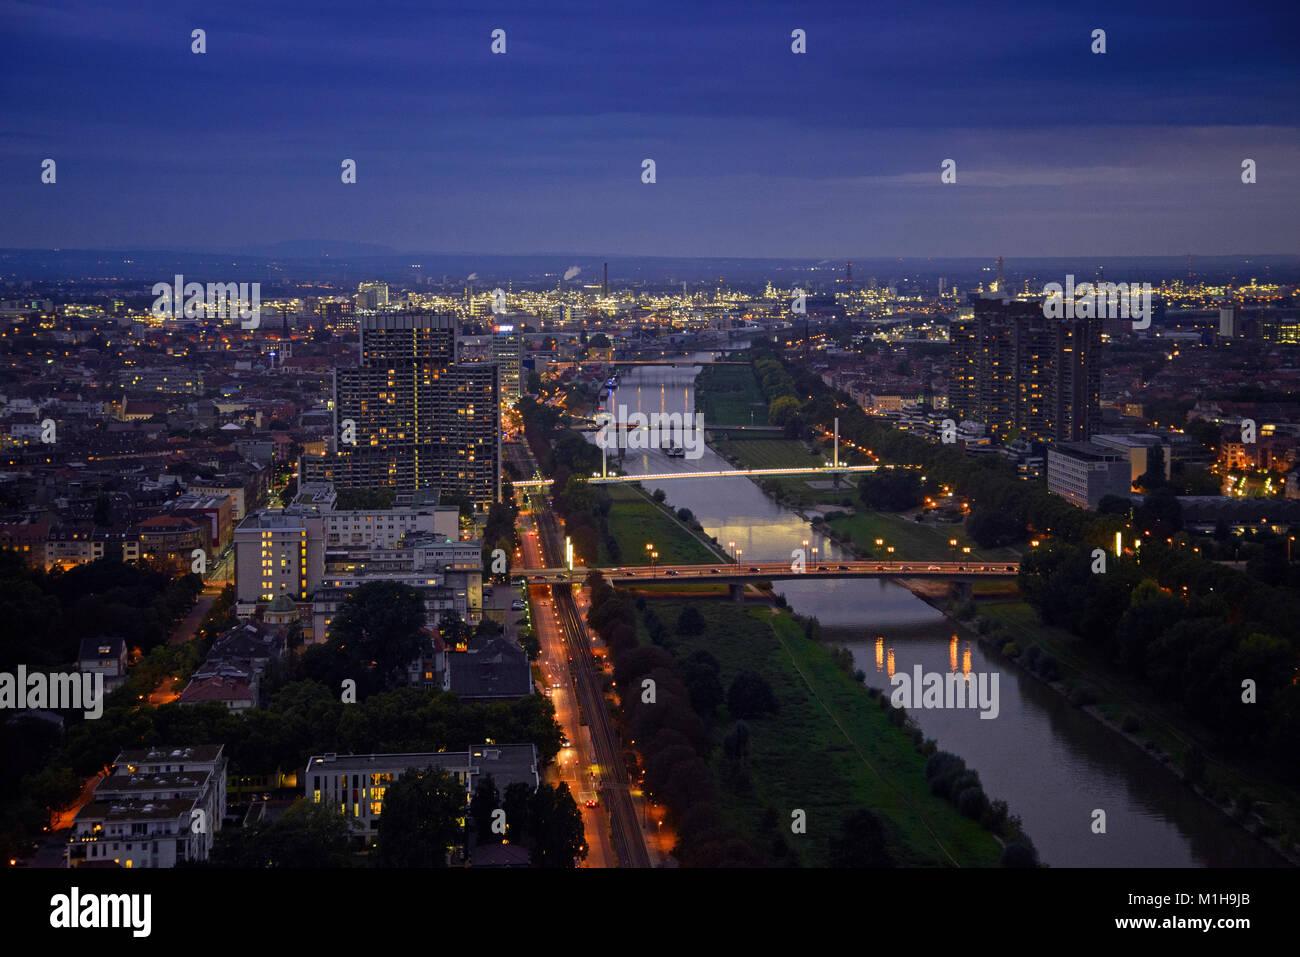 Mannheim, Blick vom Fernmeldeturm - Stock Image